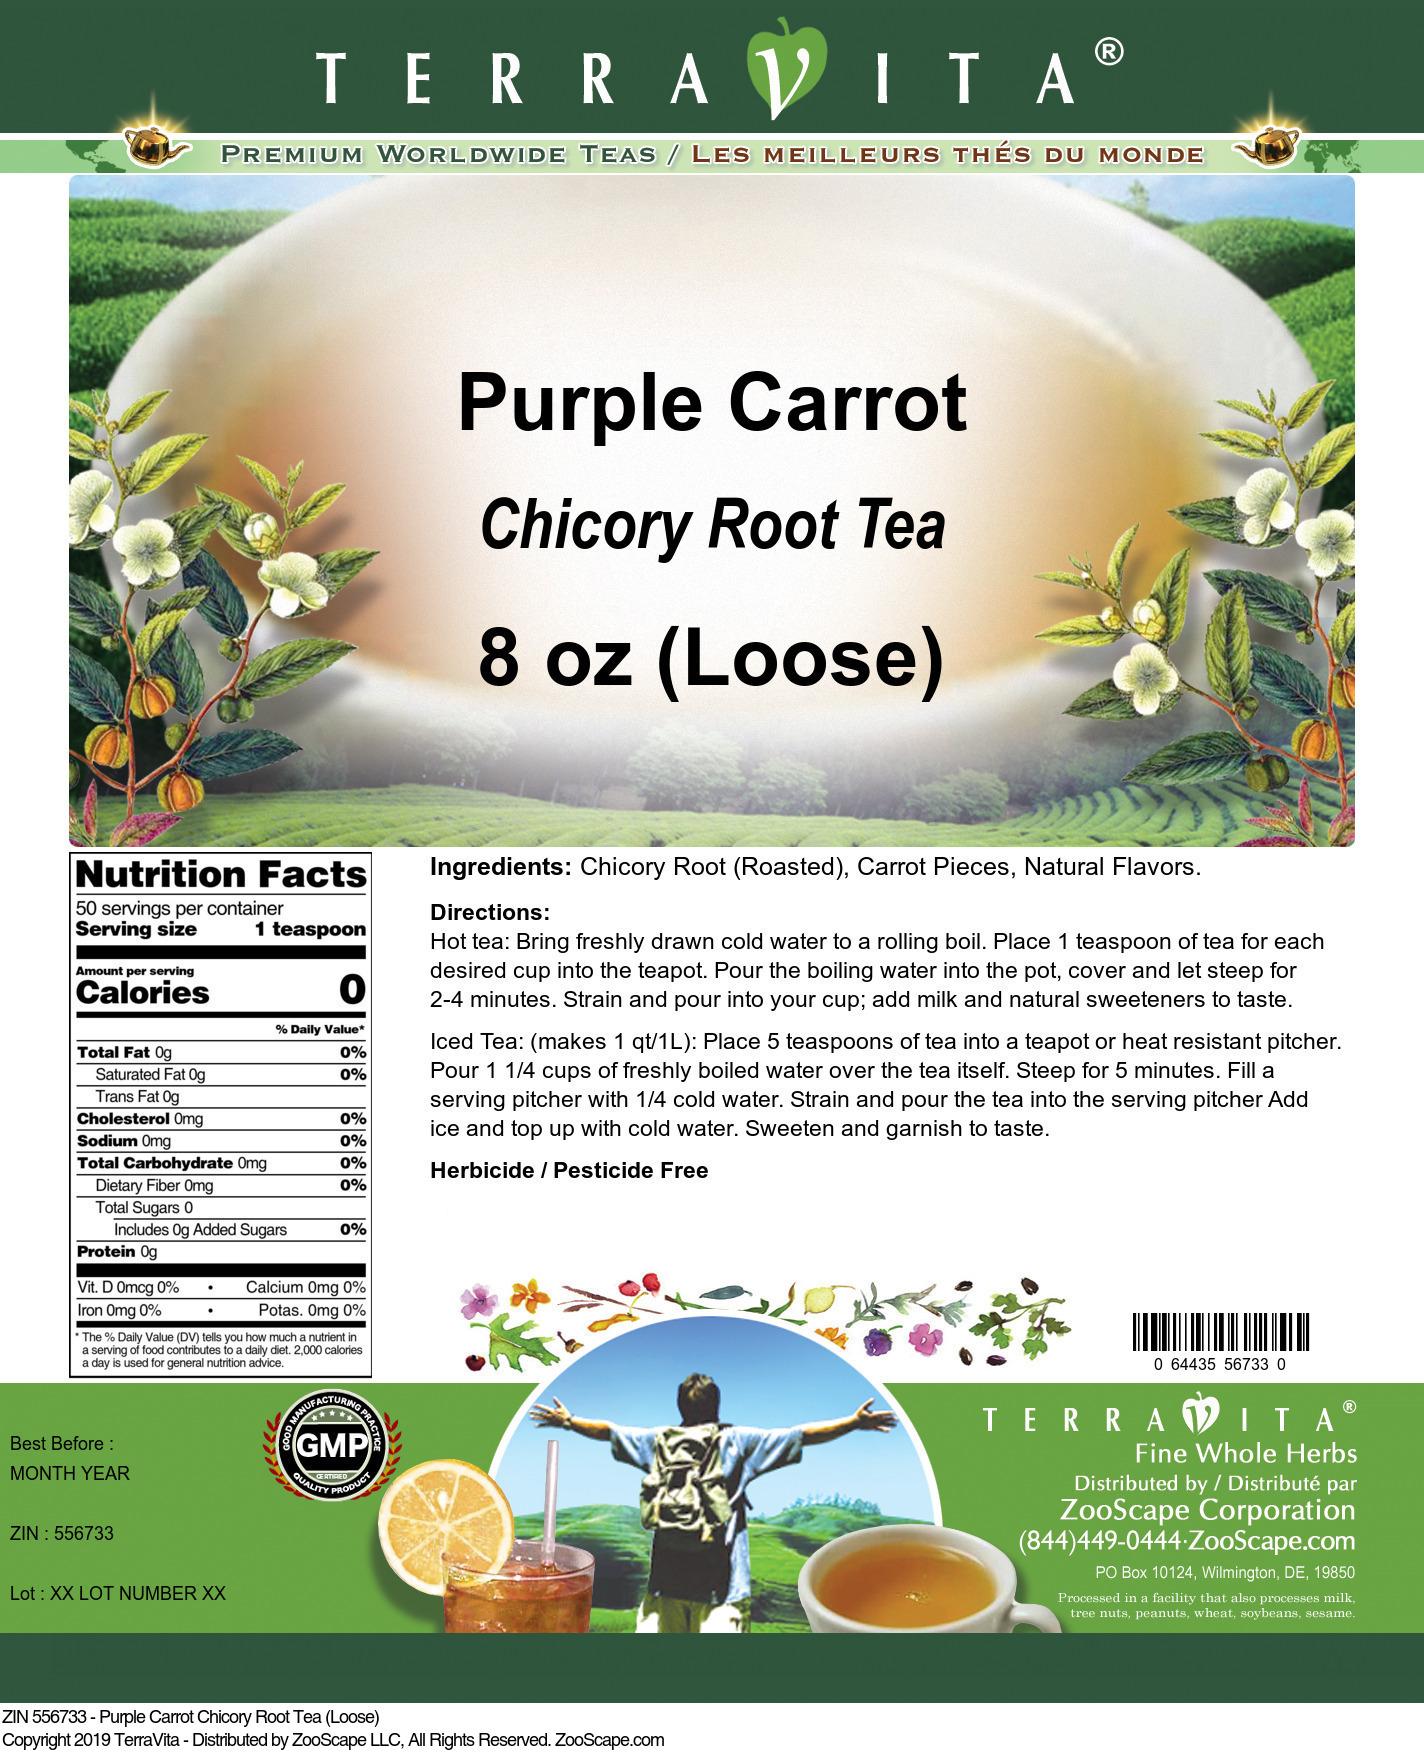 Purple Carrot Chicory Root Tea (Loose)